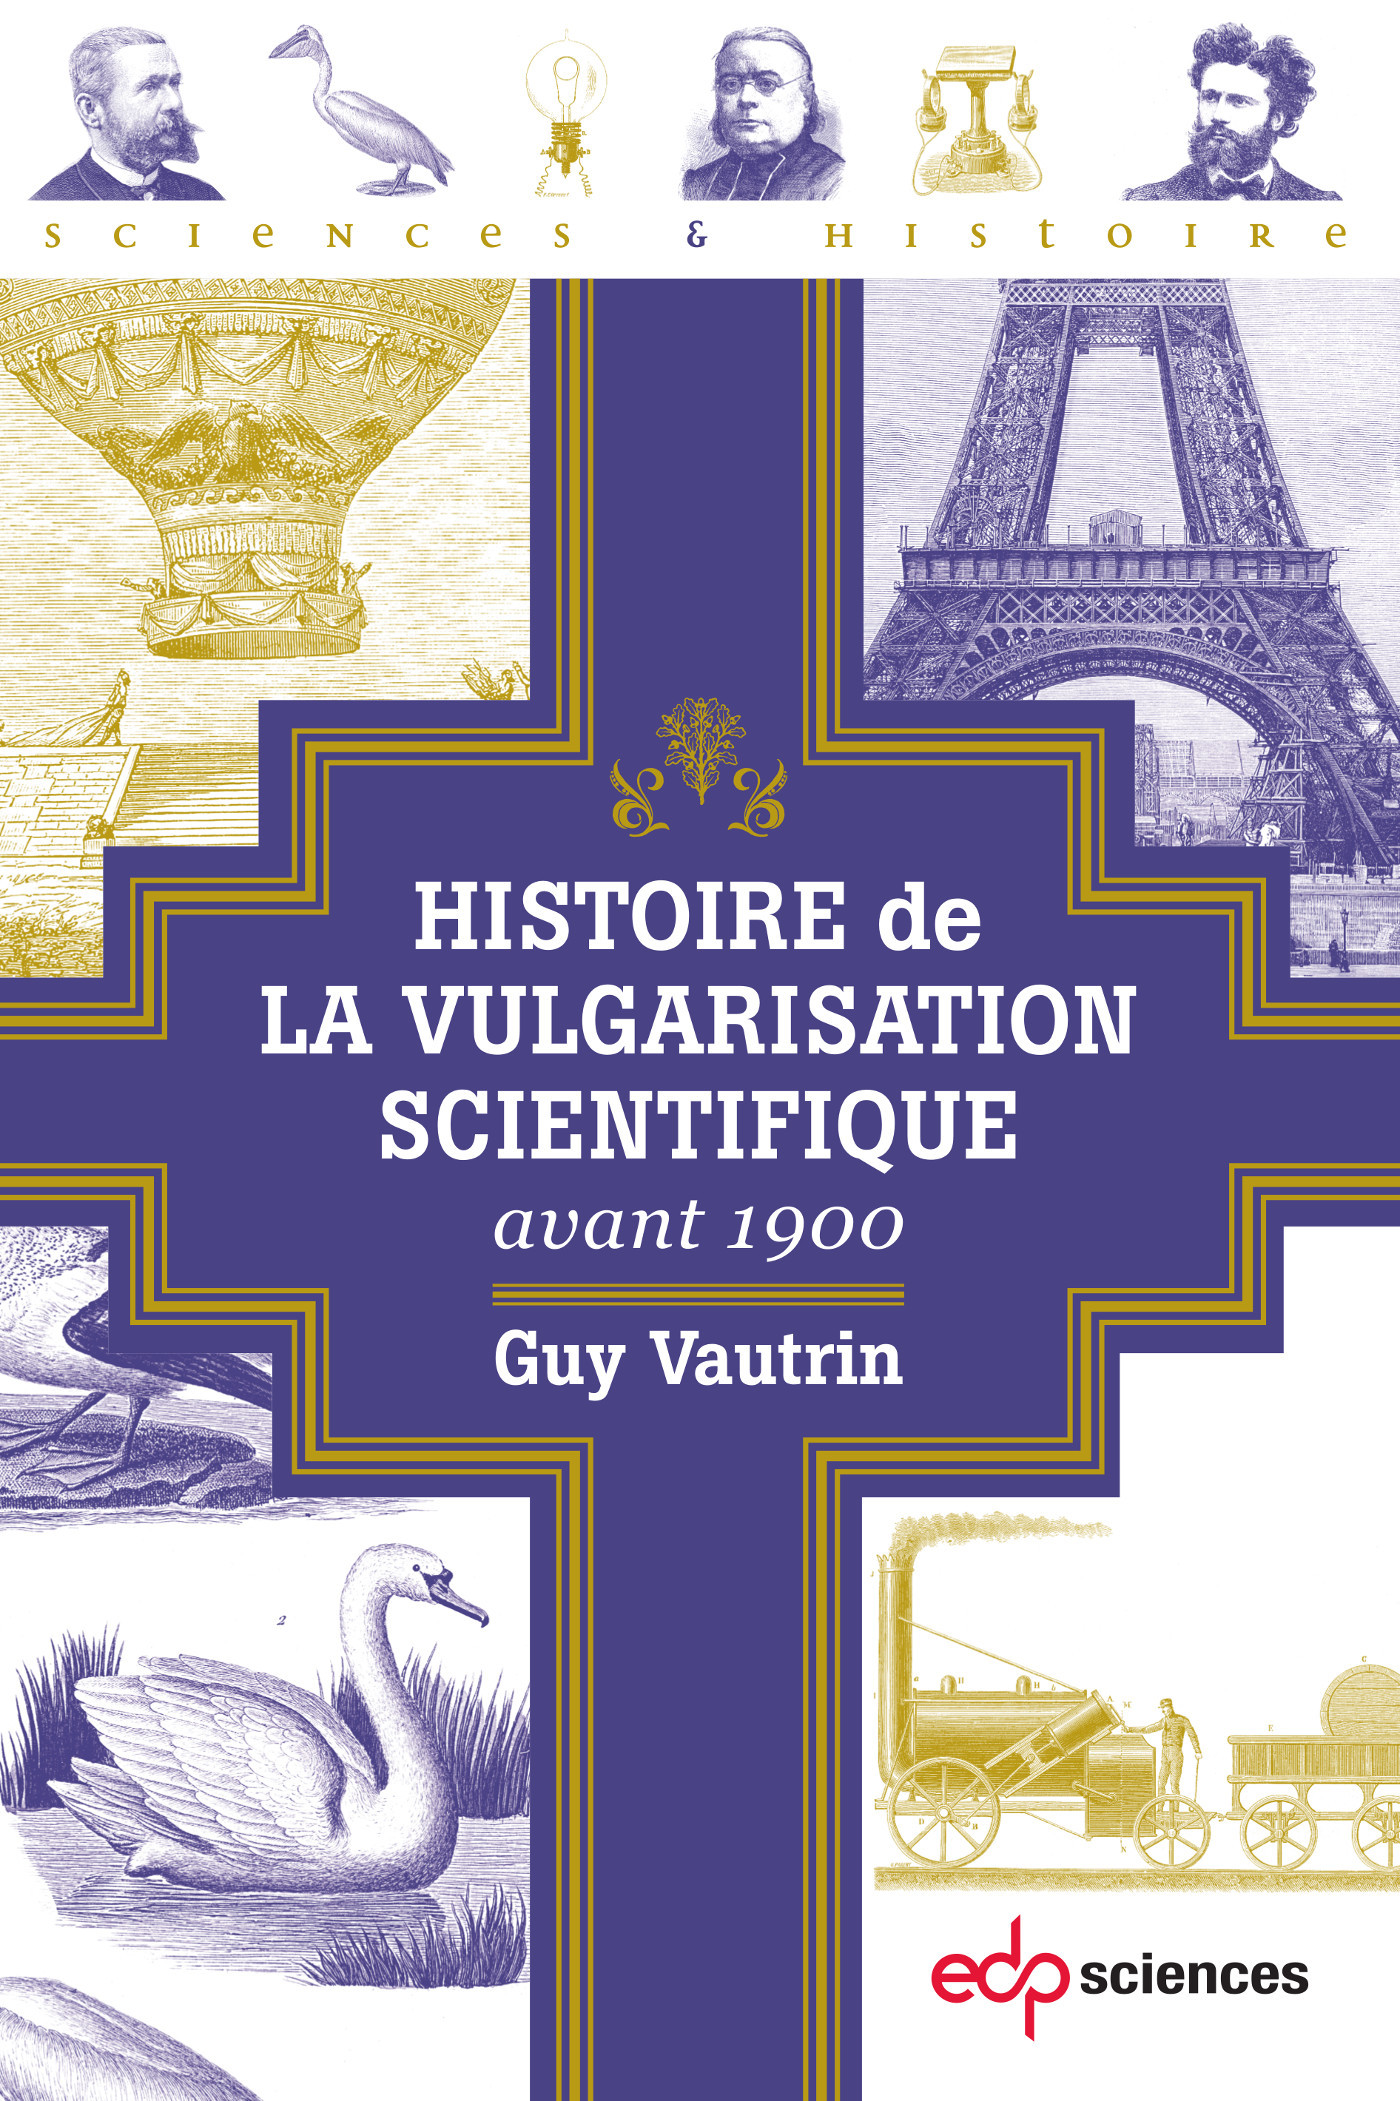 HISTOIRE DE LA VULGARISATION SCIENTIFIQUE AVANT 1900